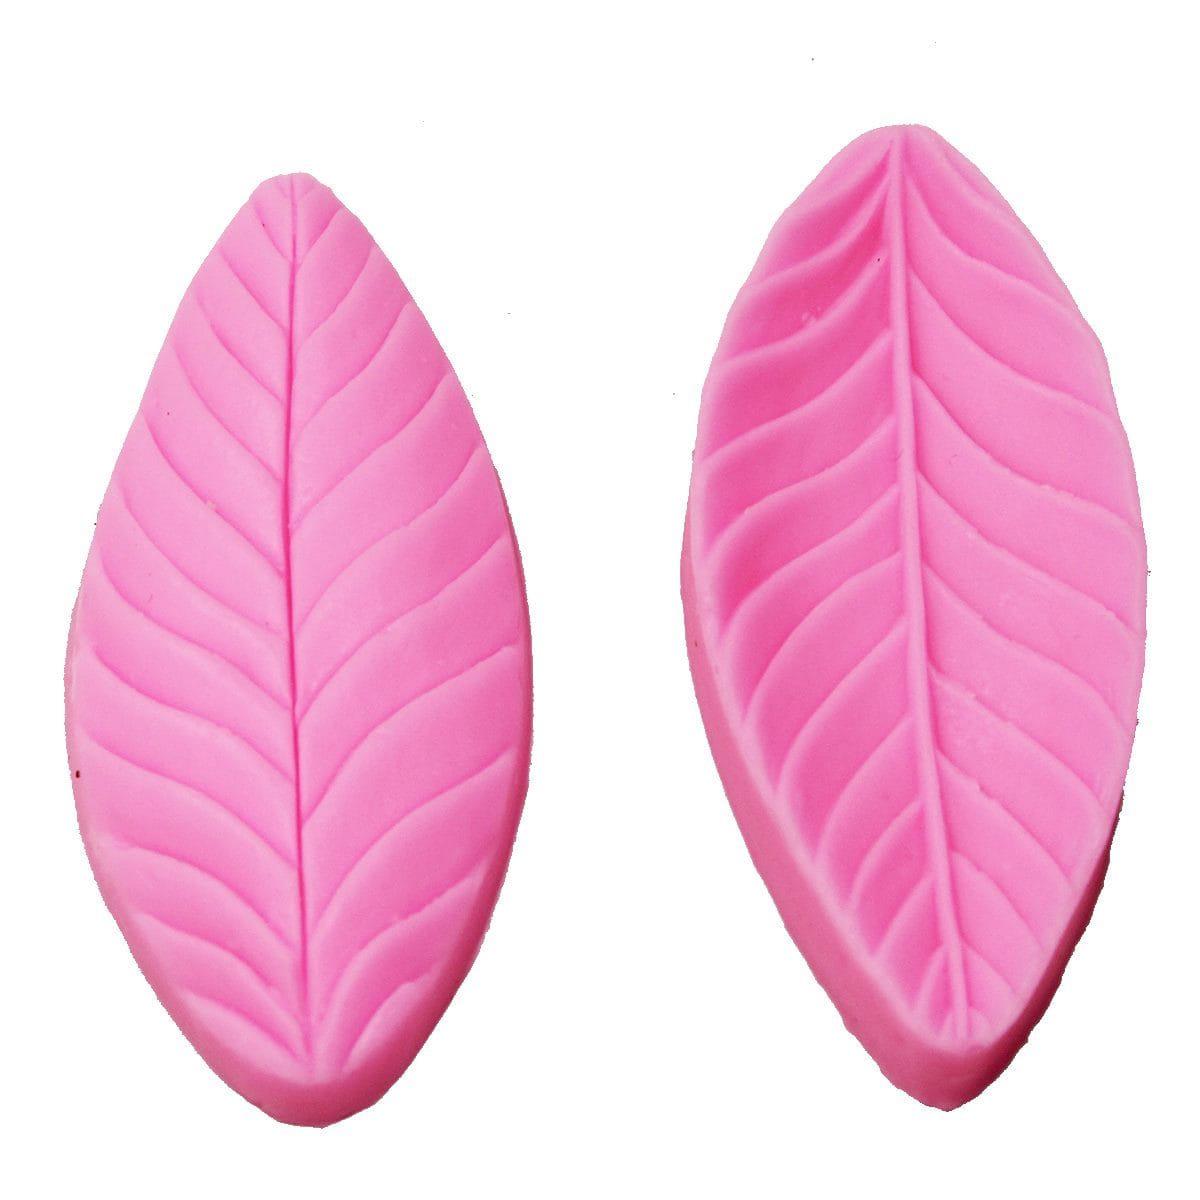 Resin Silicone Mould Leaf Design